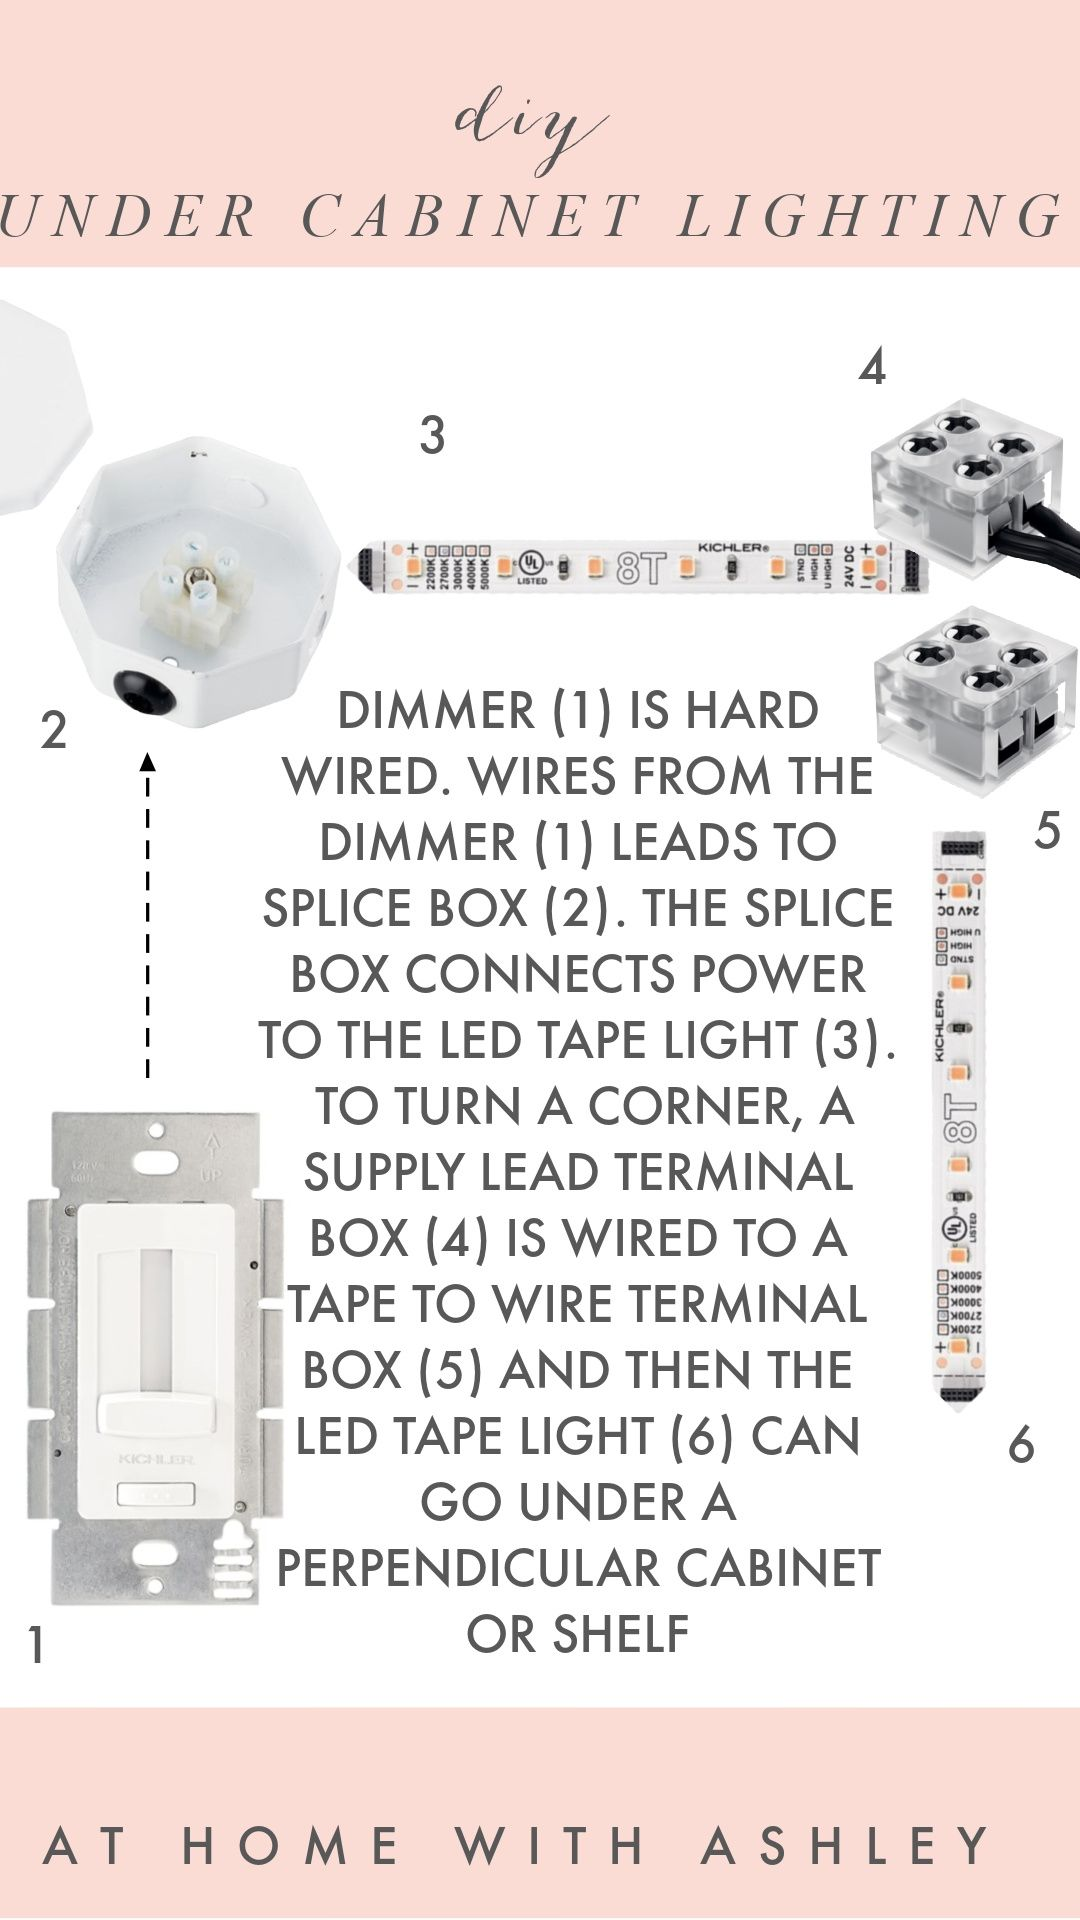 Diy Under Cabinet Lighting In 2021 Under Cabinet Lighting Cabinet Lighting Led Tape Lighting